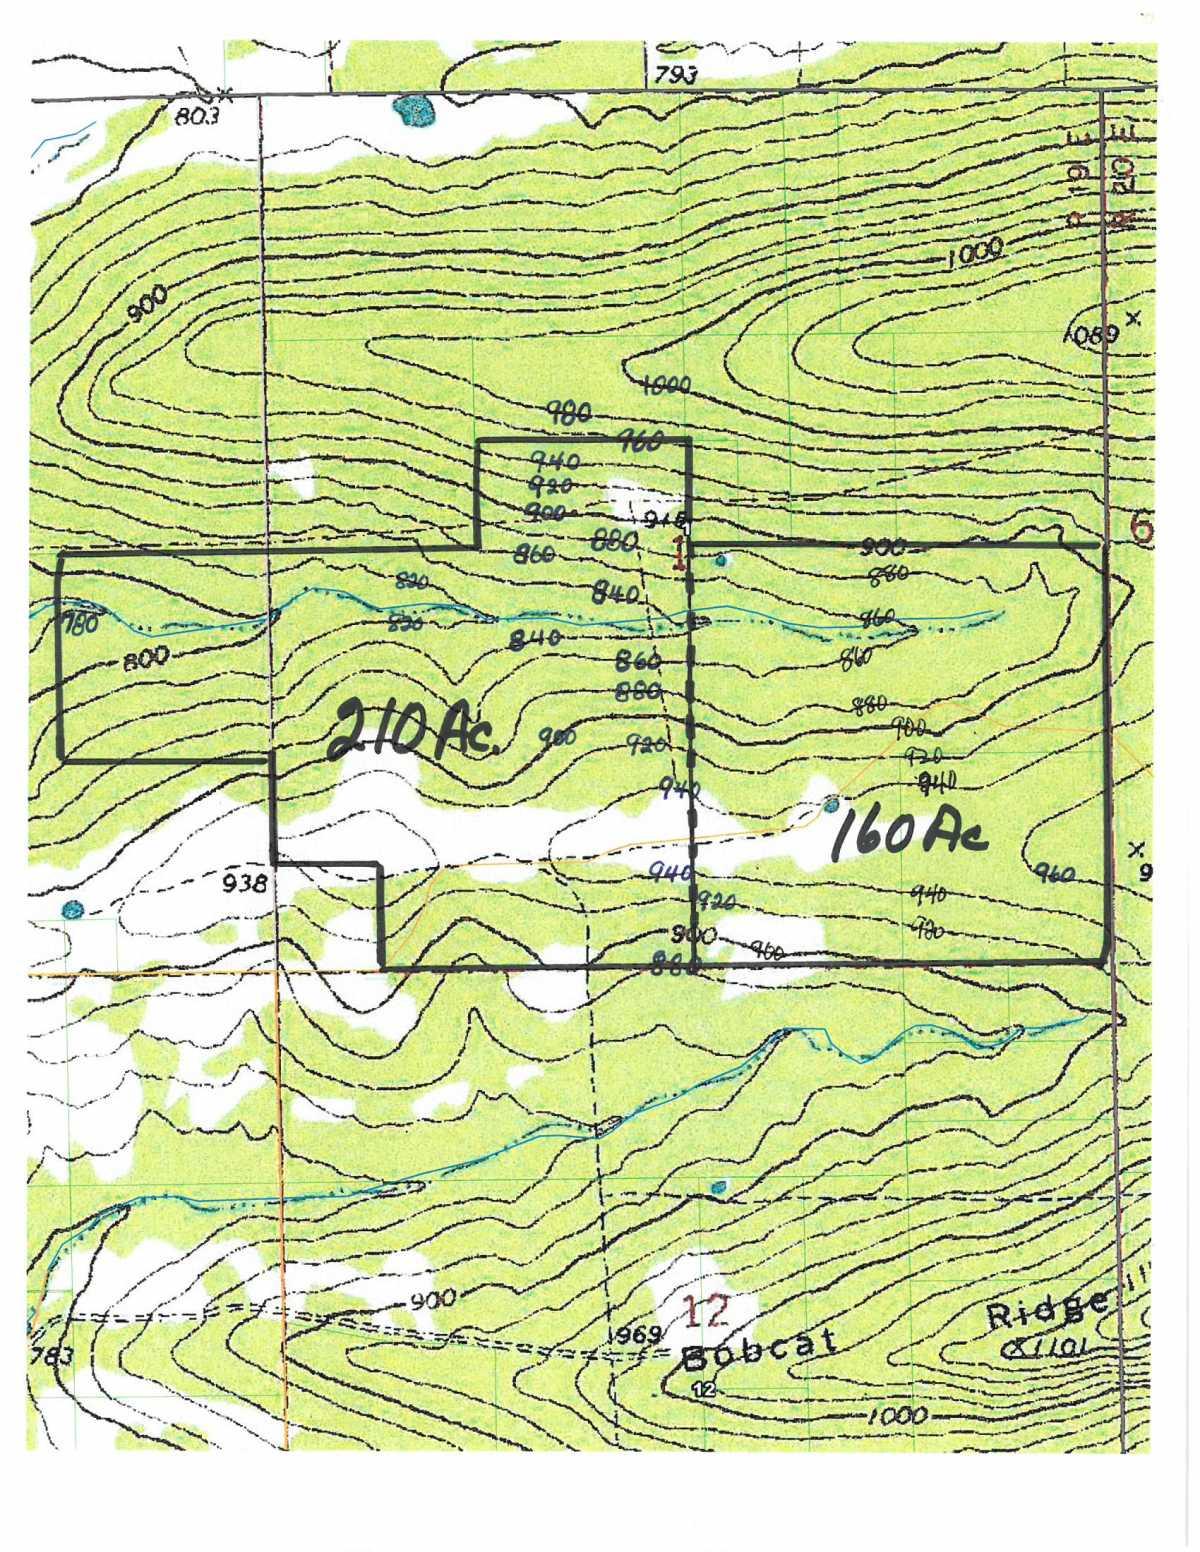 OKlahoma hunting land, Oklahoma Cabin, K hunting cabin ponds | Holsten Lane, 2022 Wilburton, OK 74578 2